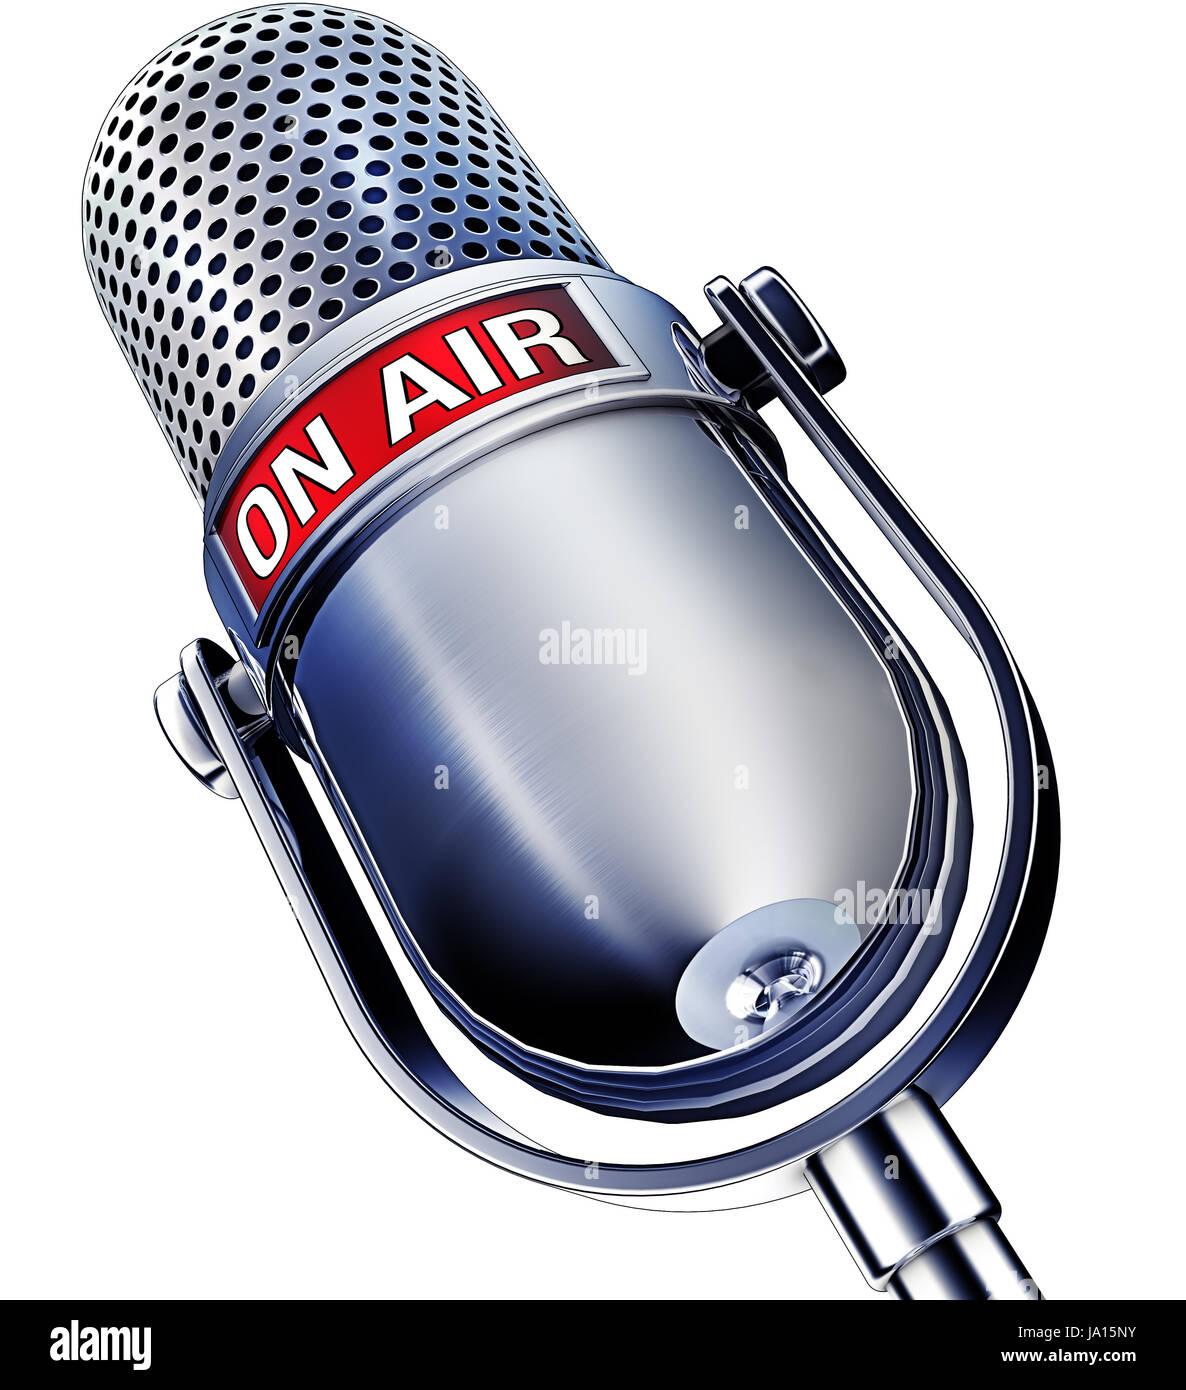 entertainment, music, news, radio, microphone, coverage, sign, signal, talk, Stock Photo